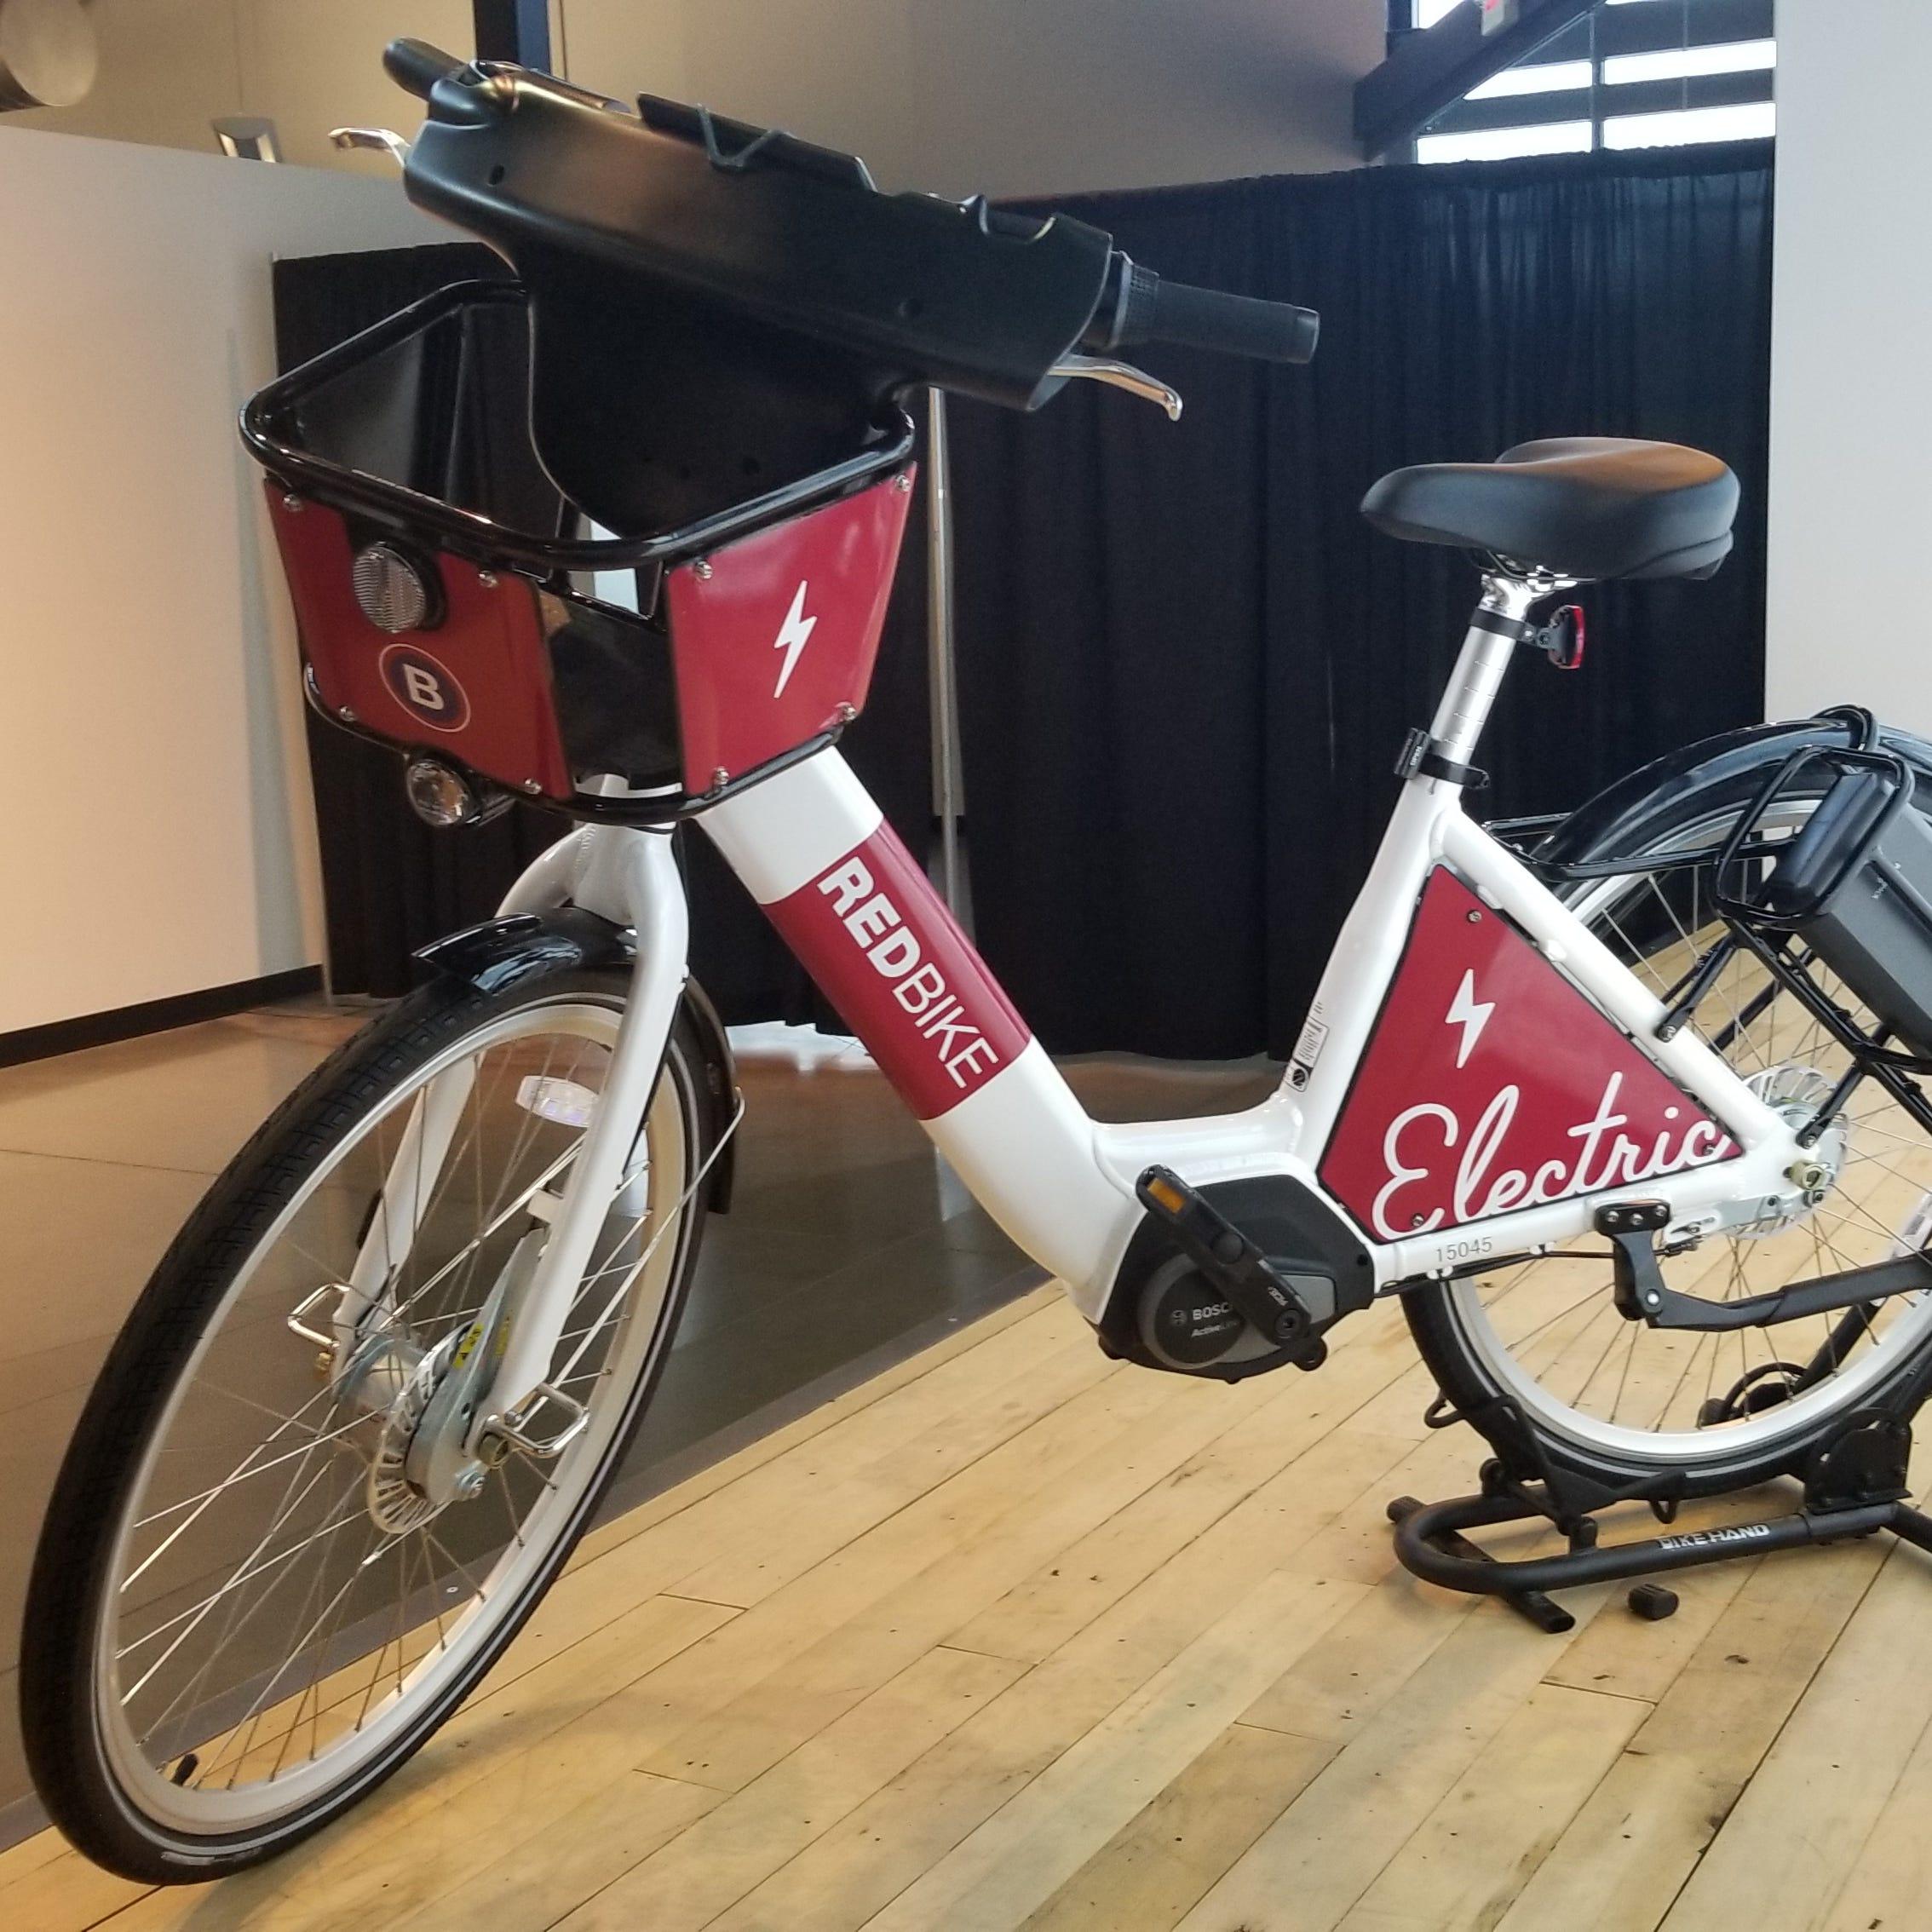 Cincinnati getting electric-assist bicycles